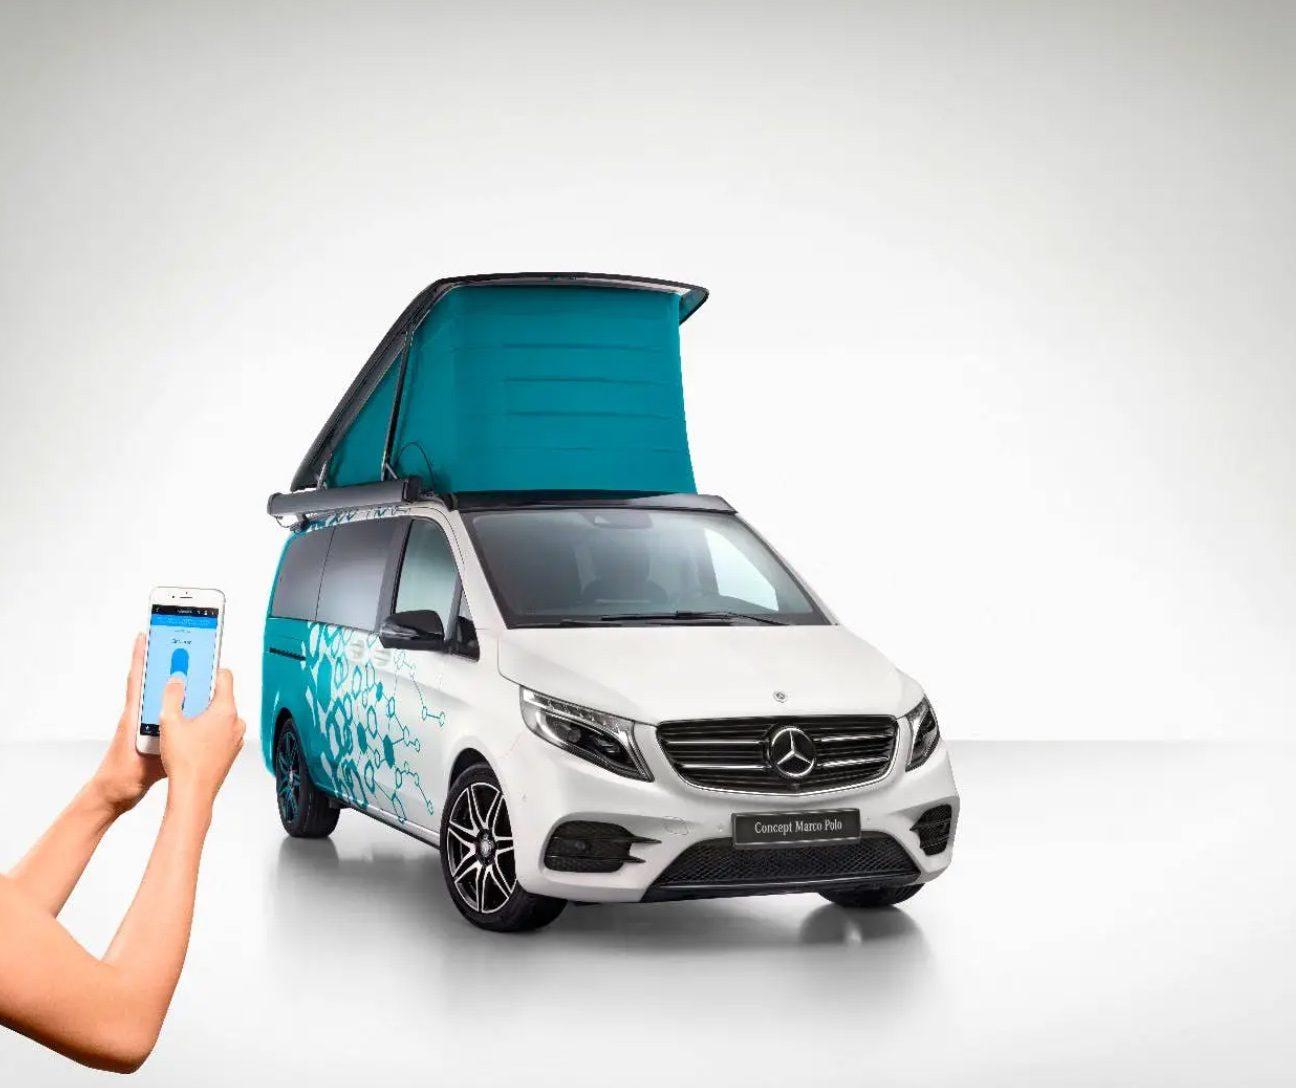 Mercedes_Camper_Concept_Marco_Polo_Smart_Camper_1